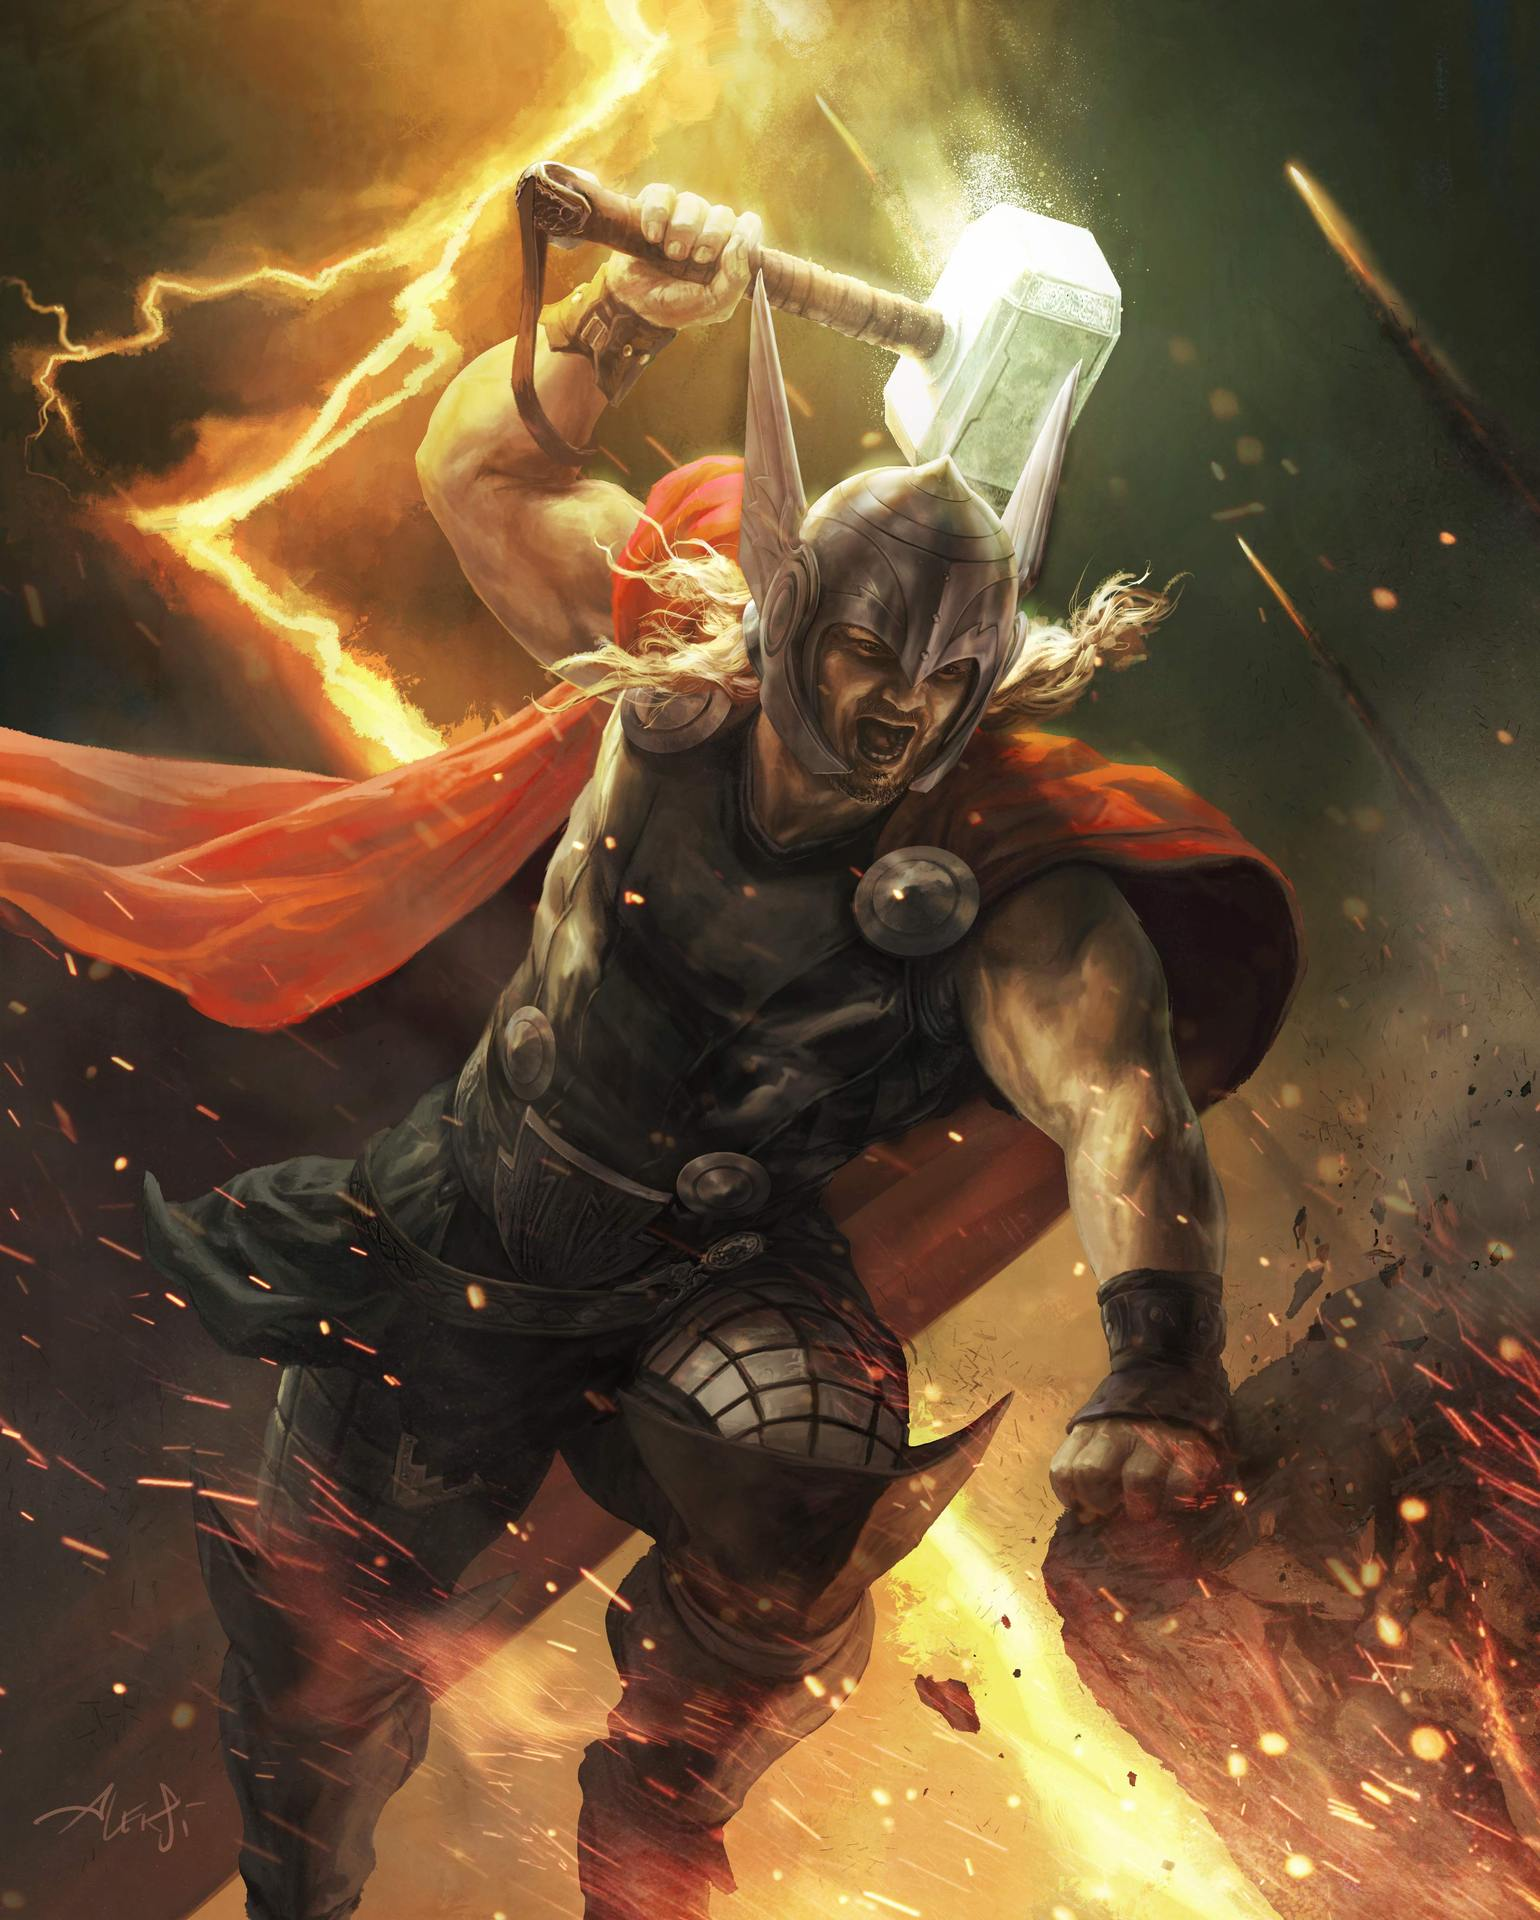 Disneymarvel thor heroiccombat final revised